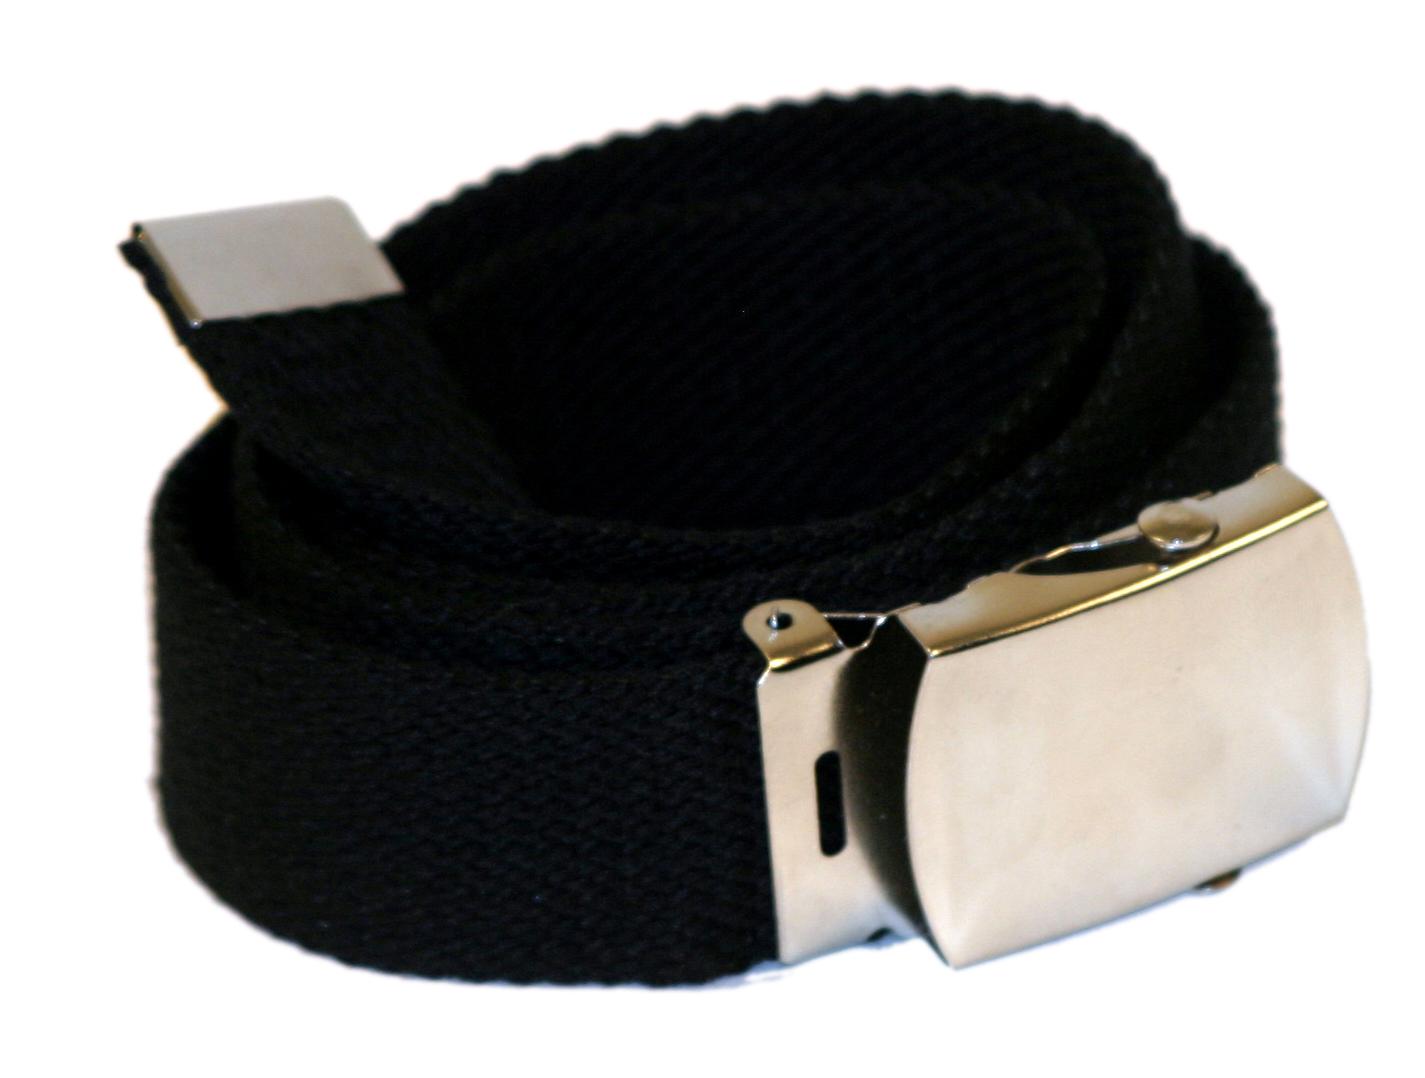 Army belt 35 mm (black)